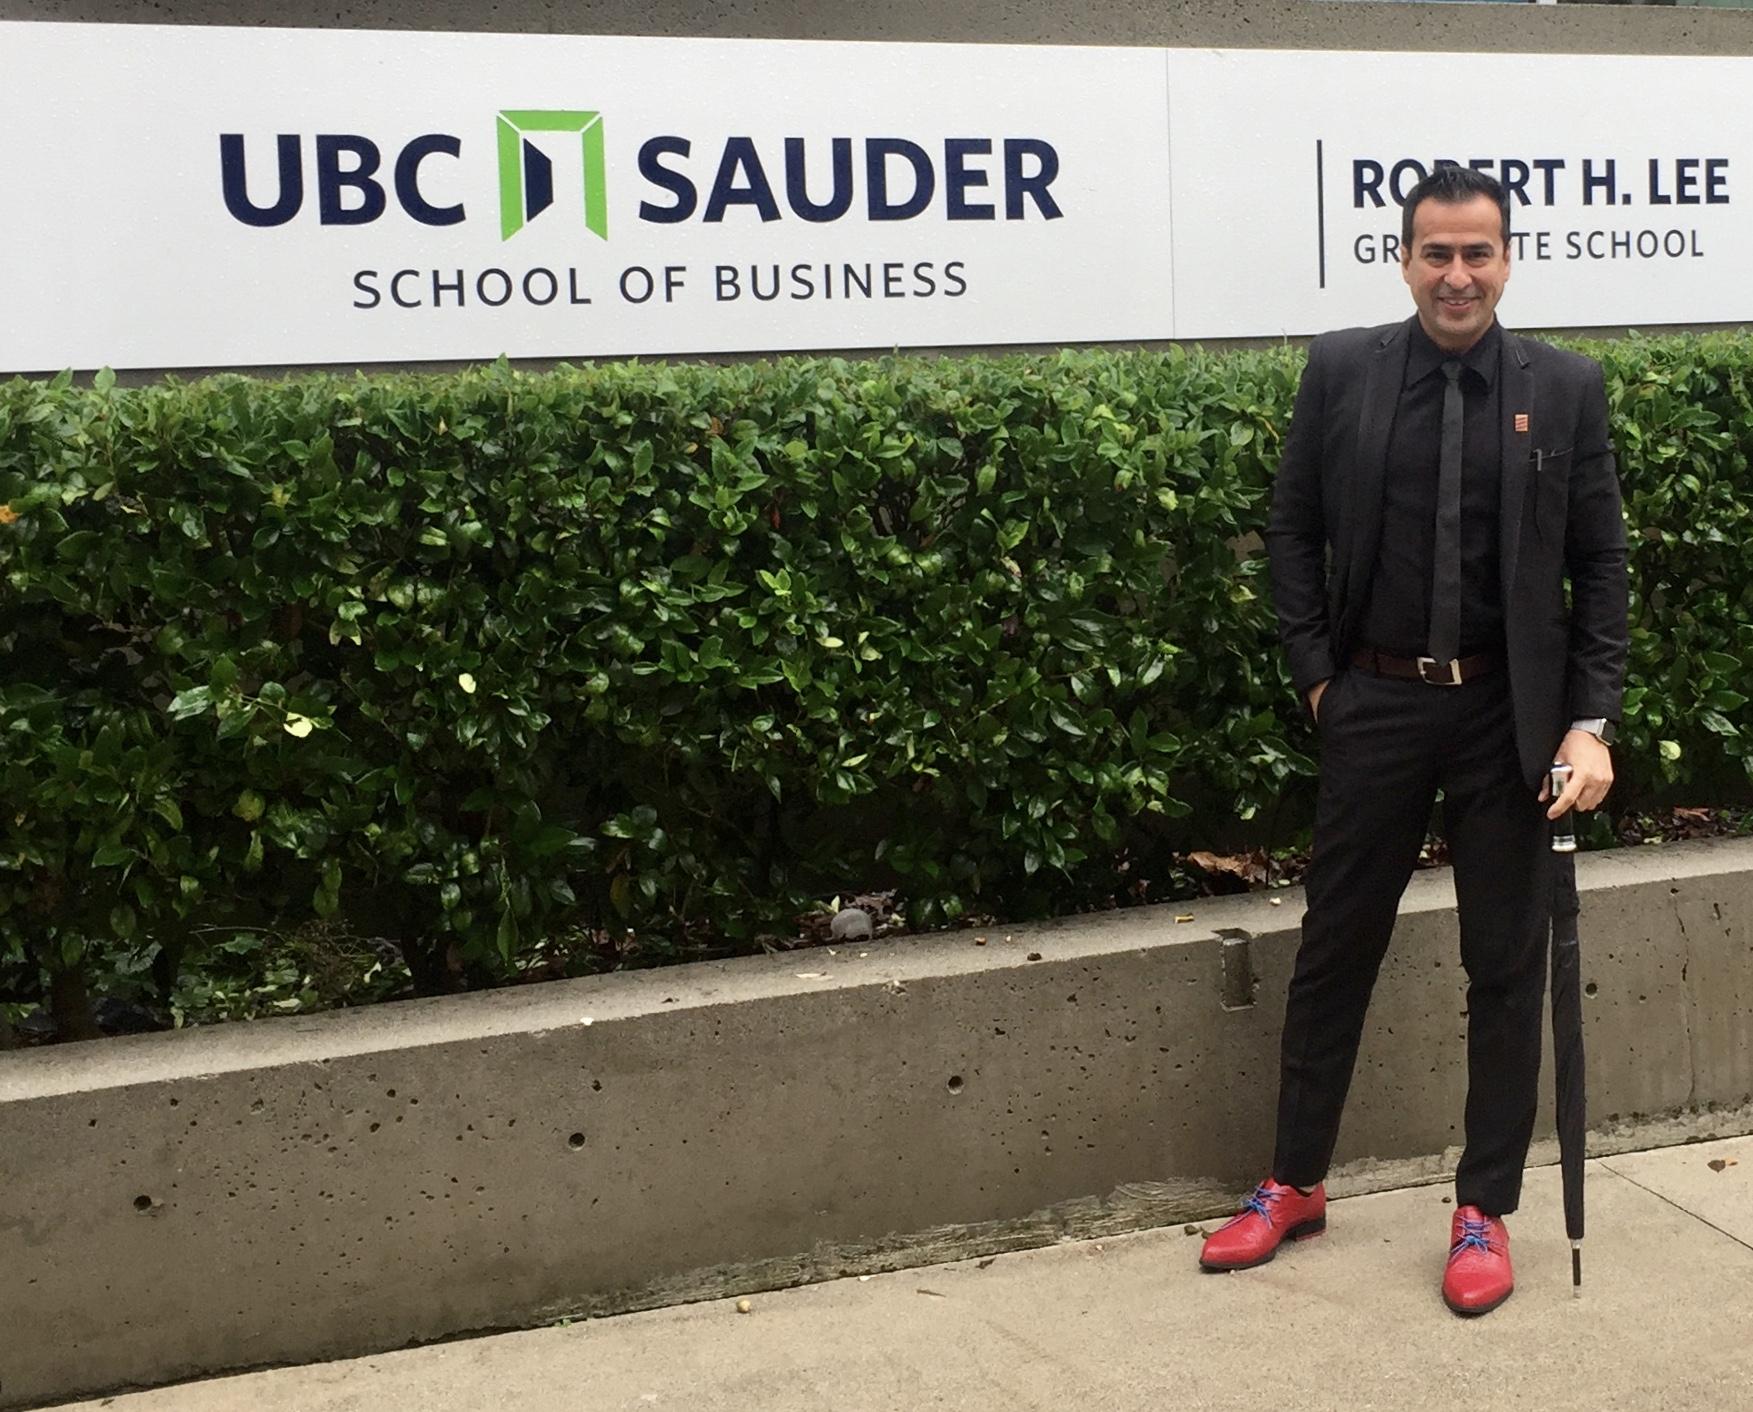 Judge for UBC Sauder School Of Business